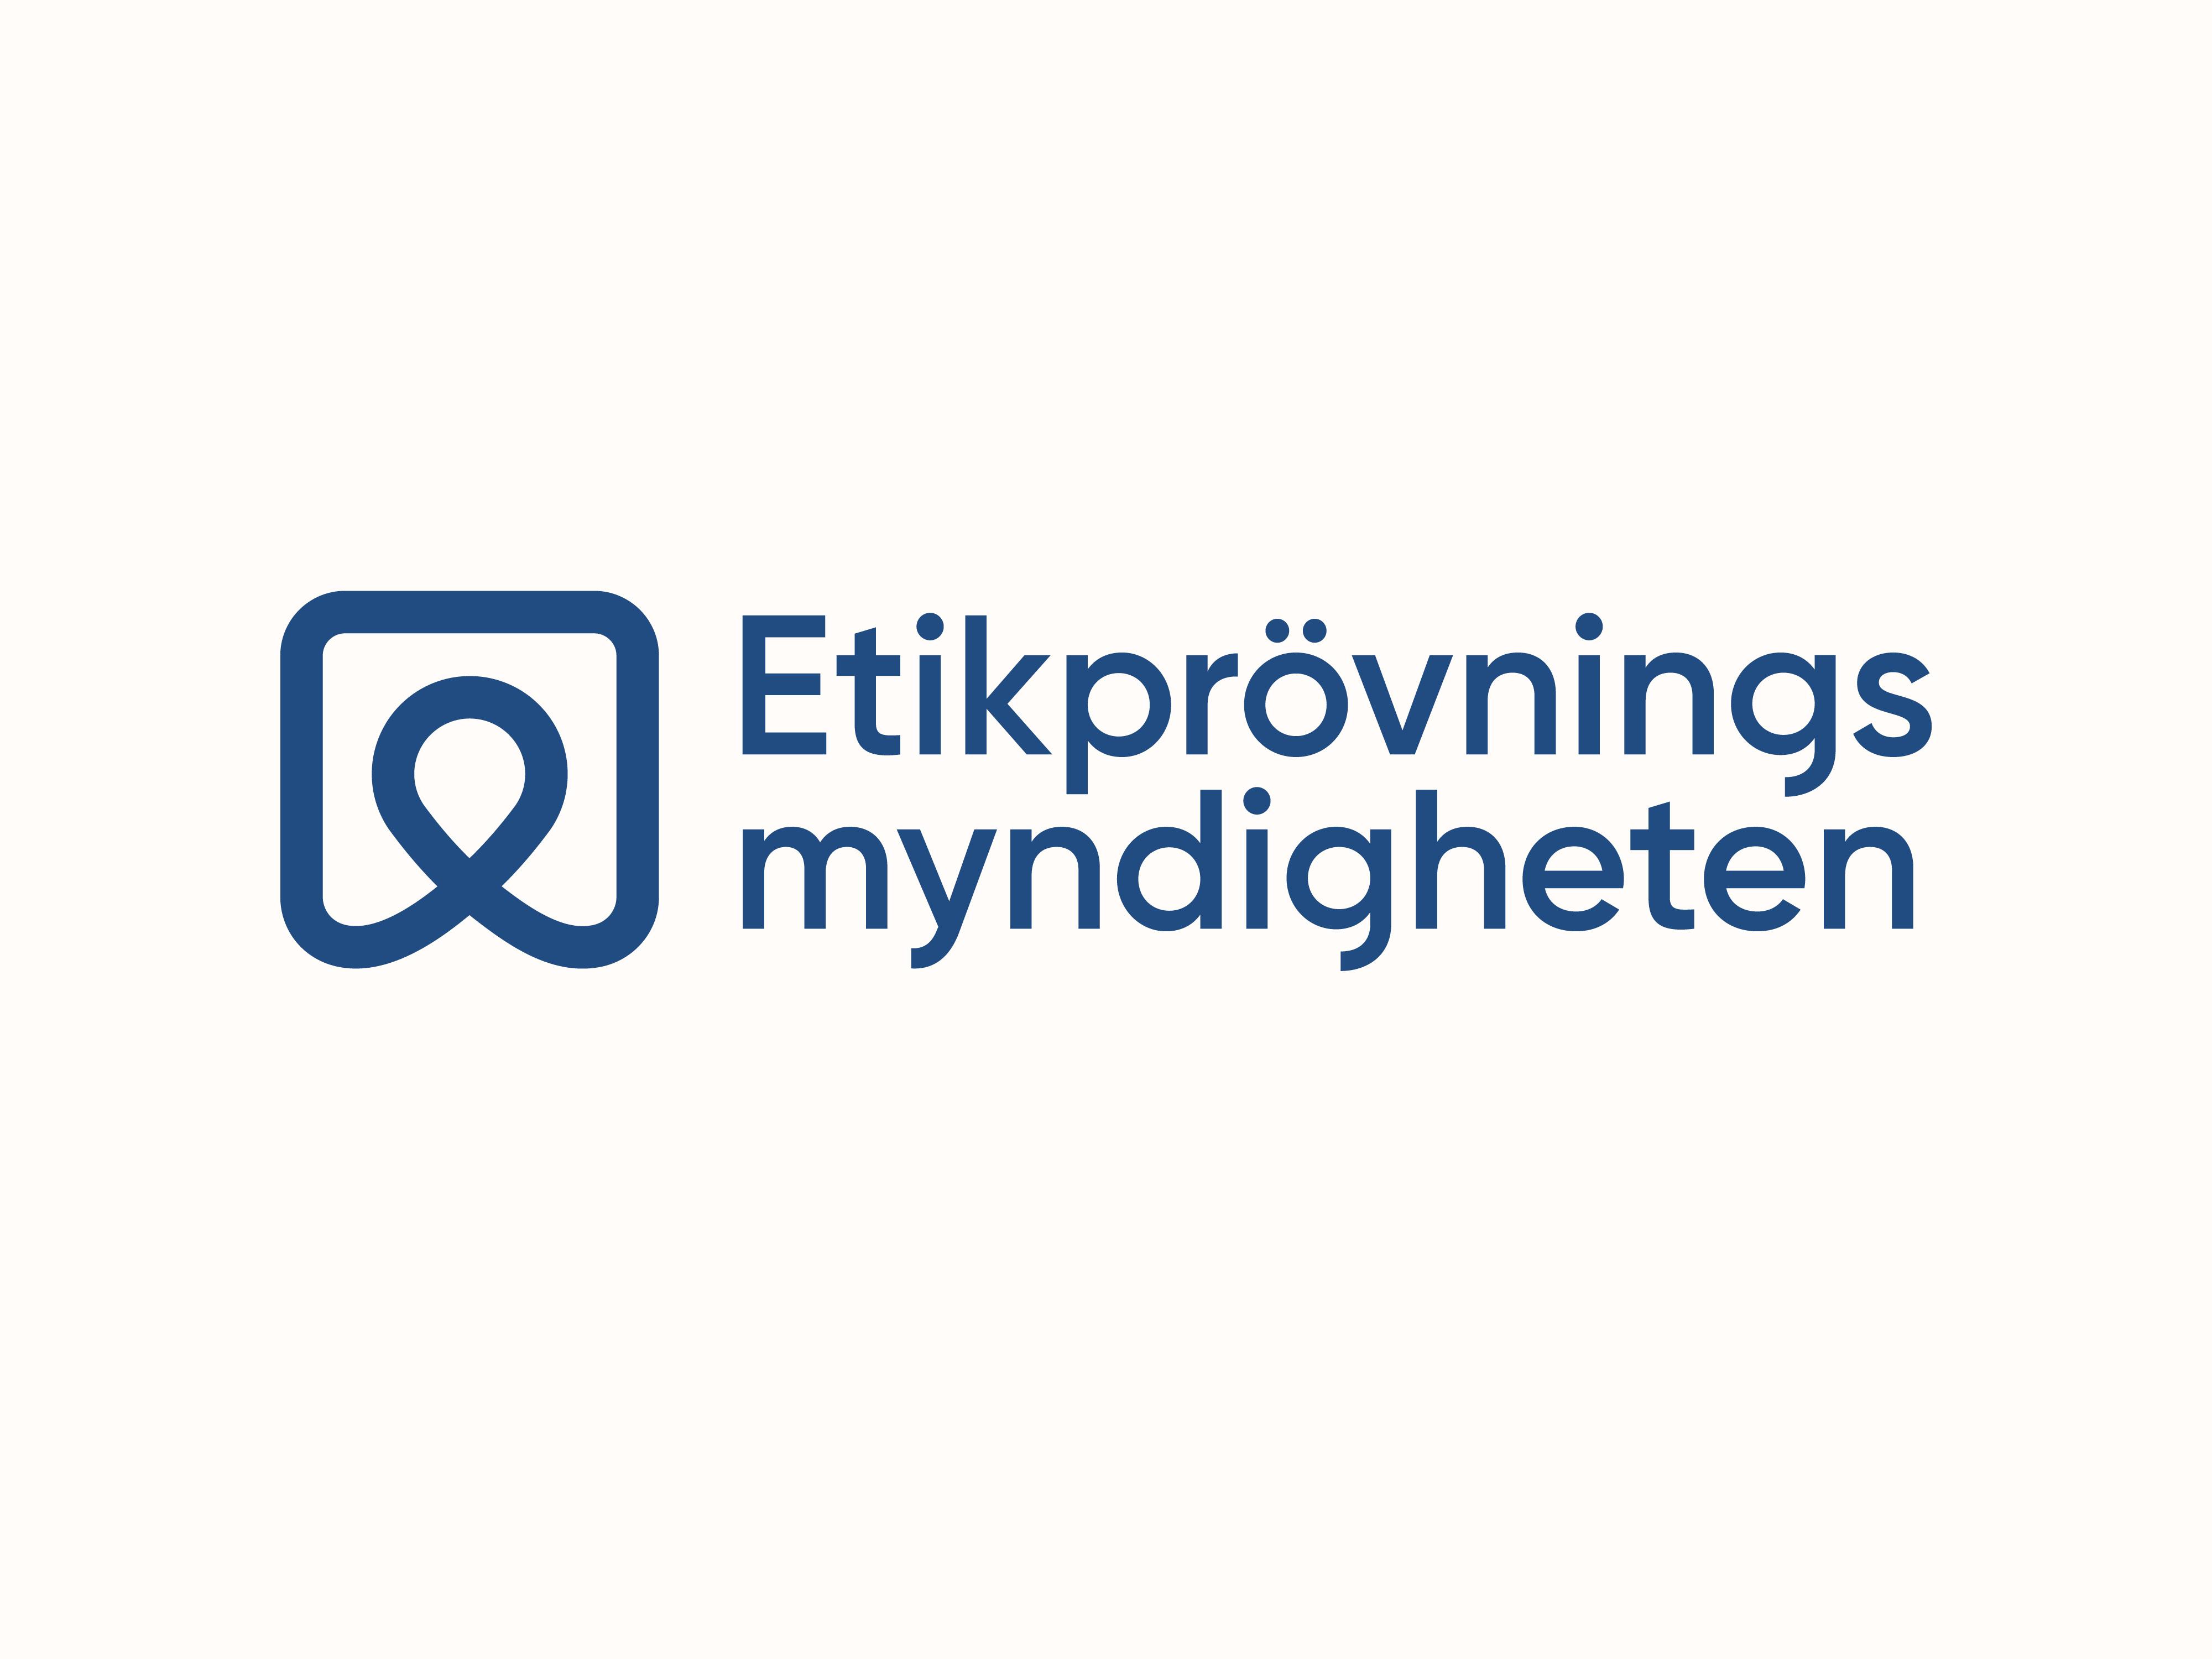 Etikprövningsmyndigheten logo